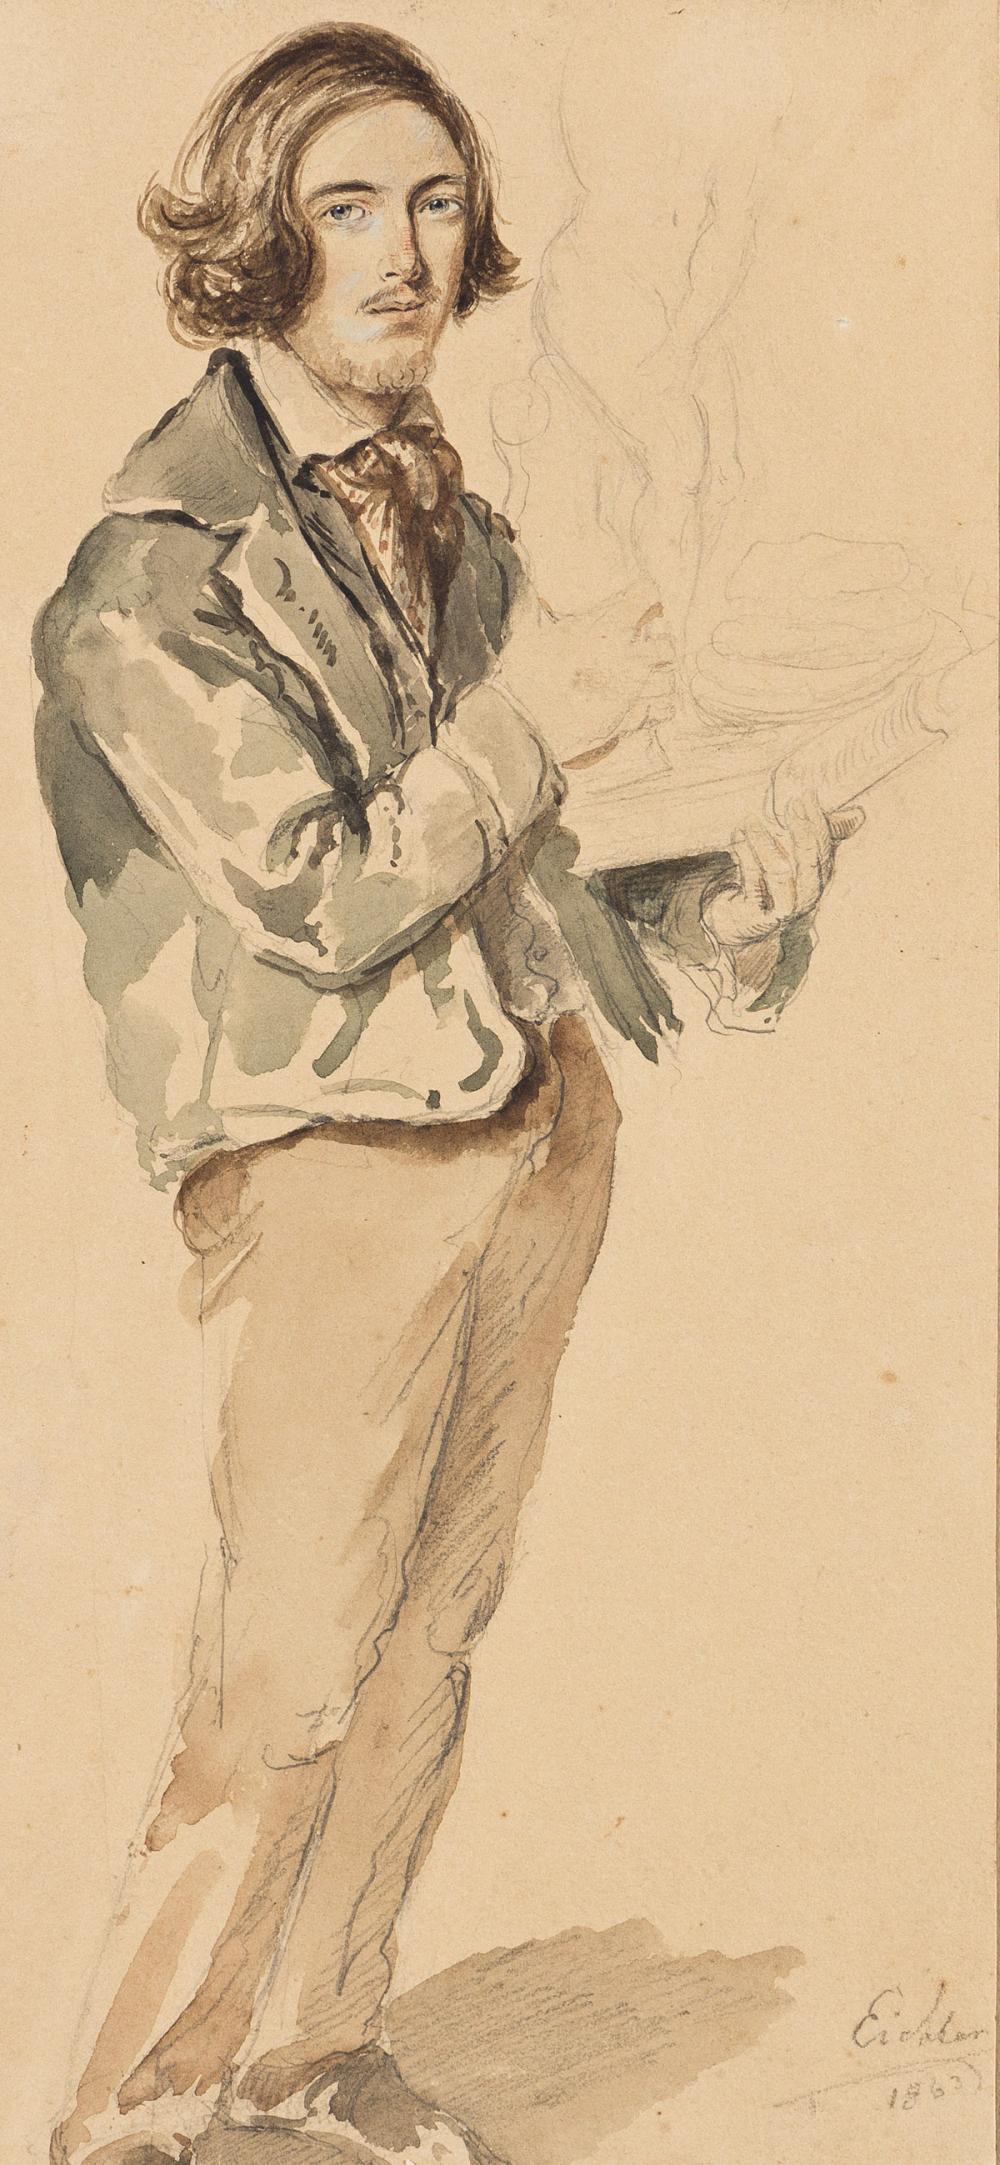 HERMANN EICHLER (Vienna 1842-1901 Vienna) Full-Length Portrait of an Artist Holding a Sculpture.